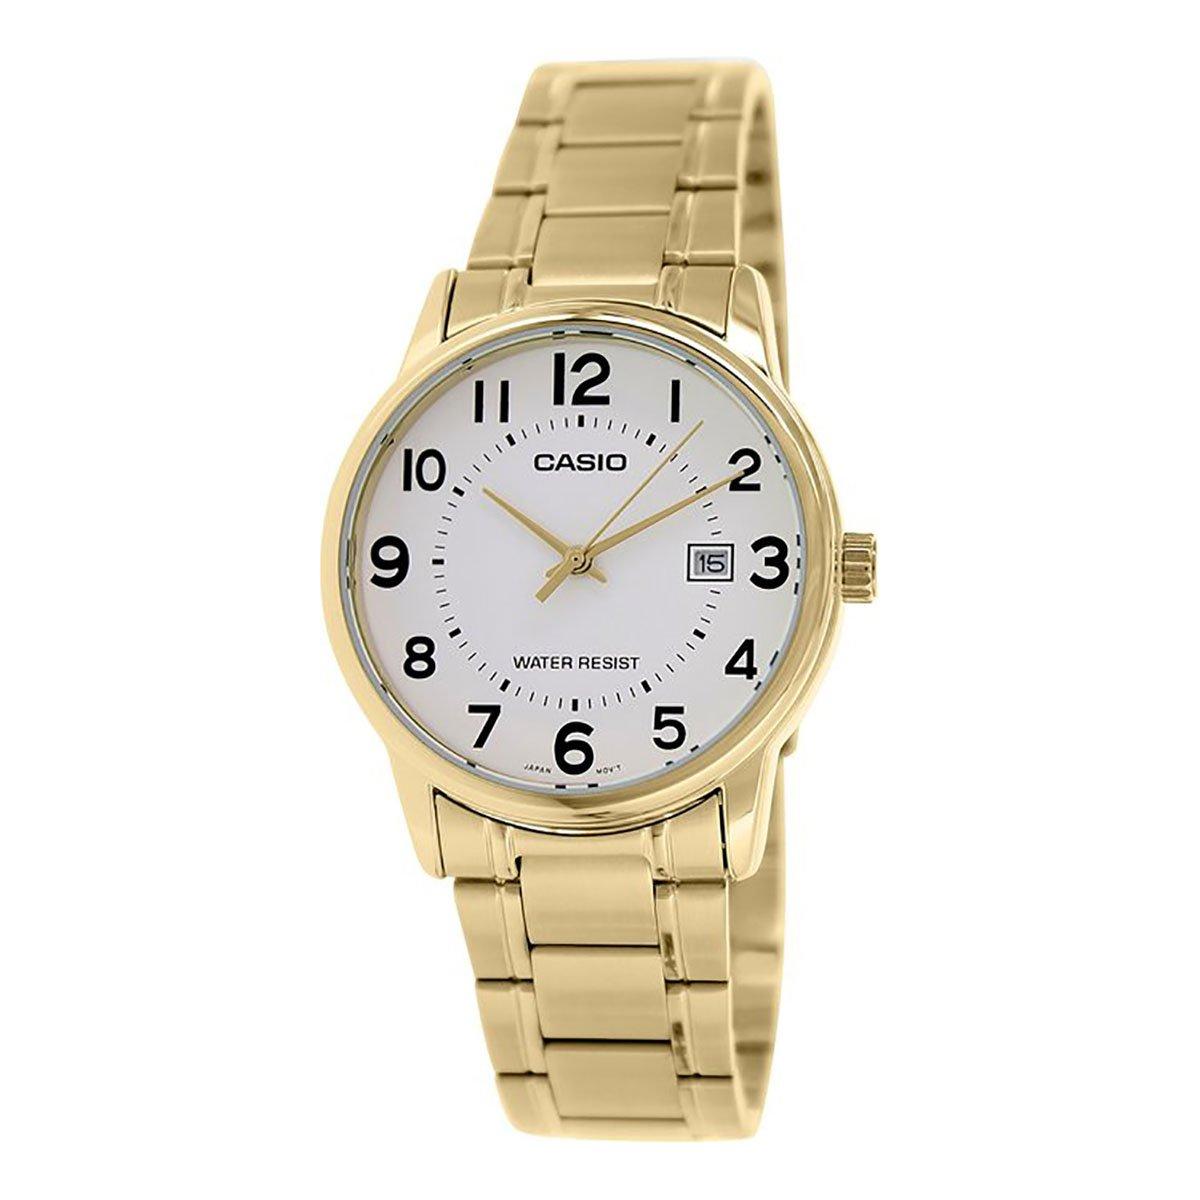 Casio Women's LTPV002G-7B Gold Stainless-Steel Quartz Watch